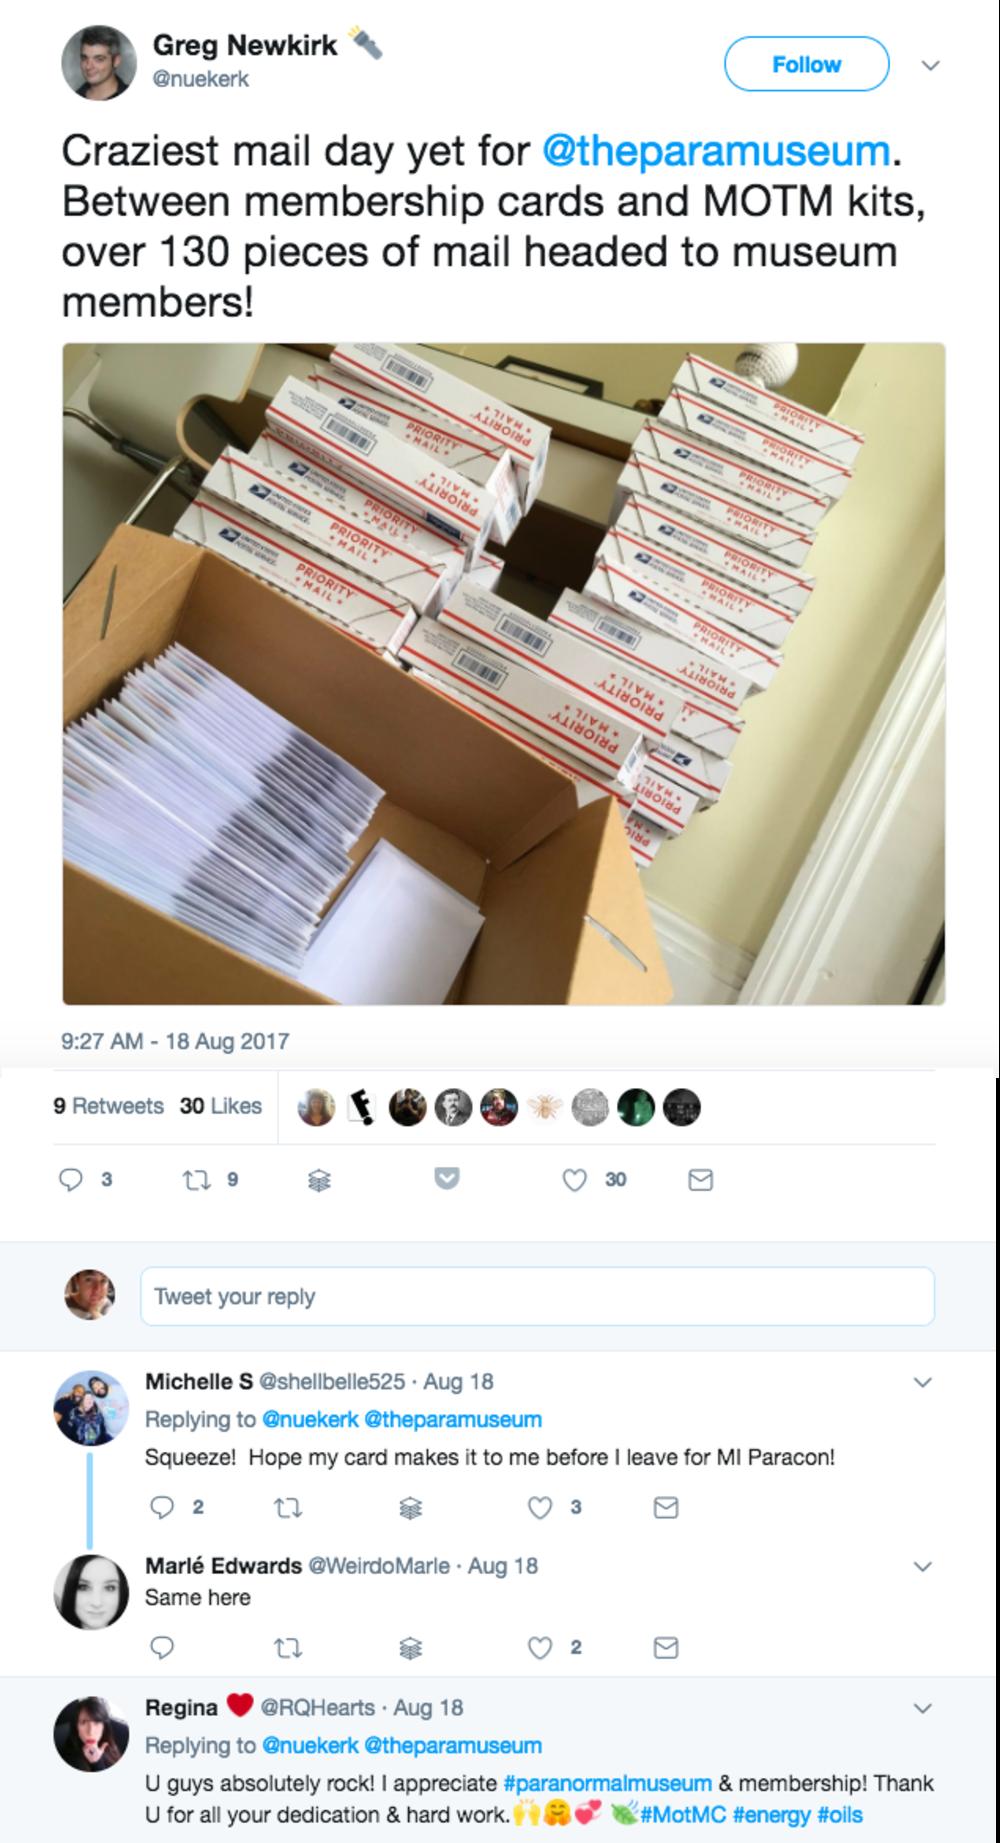 greg-newkirk-tweet